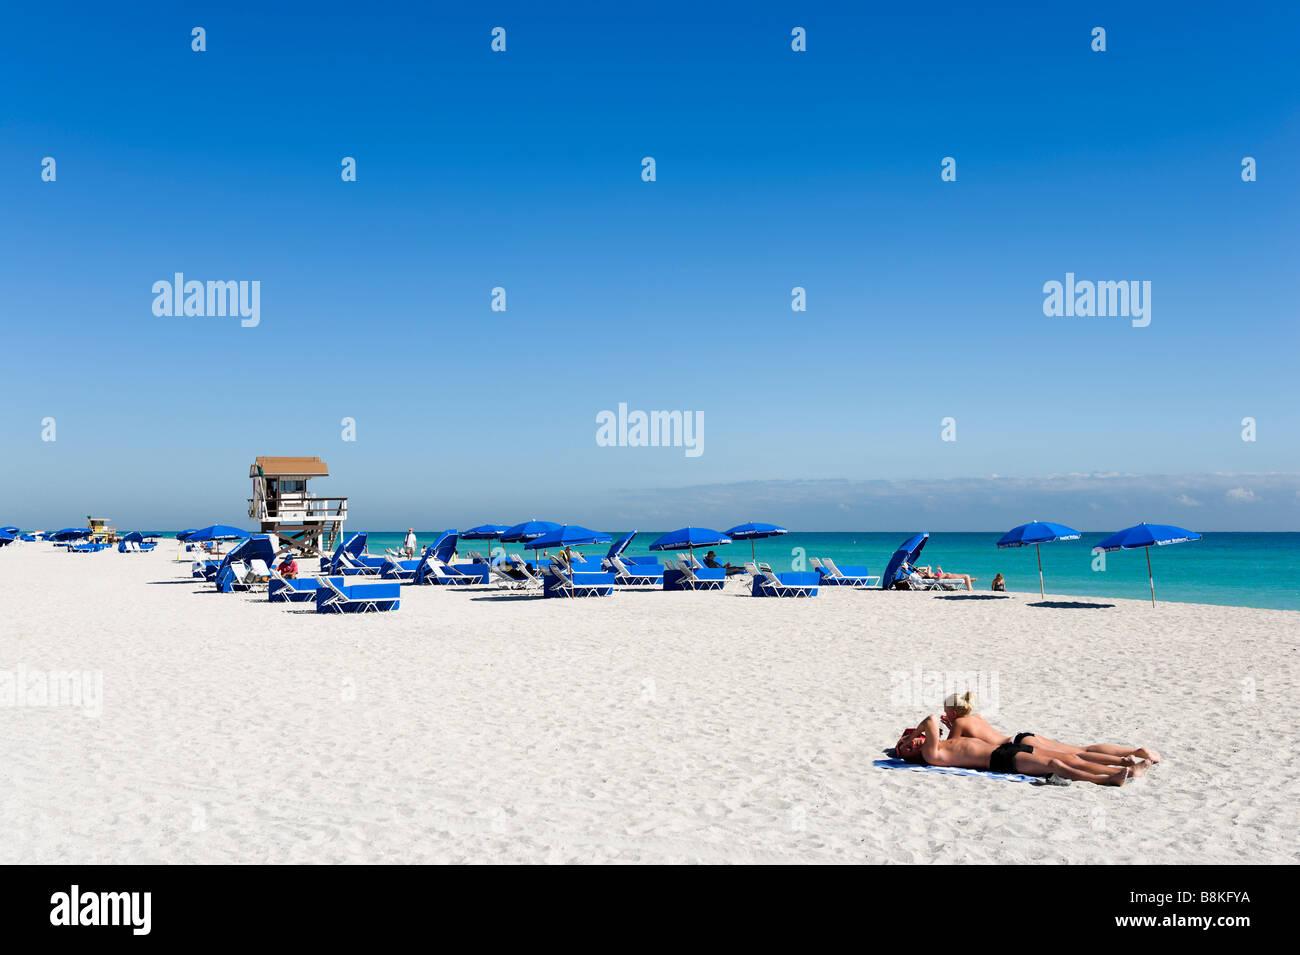 South Beach, Miami Beach, Gold Coast, Florida, USA - Stock Image